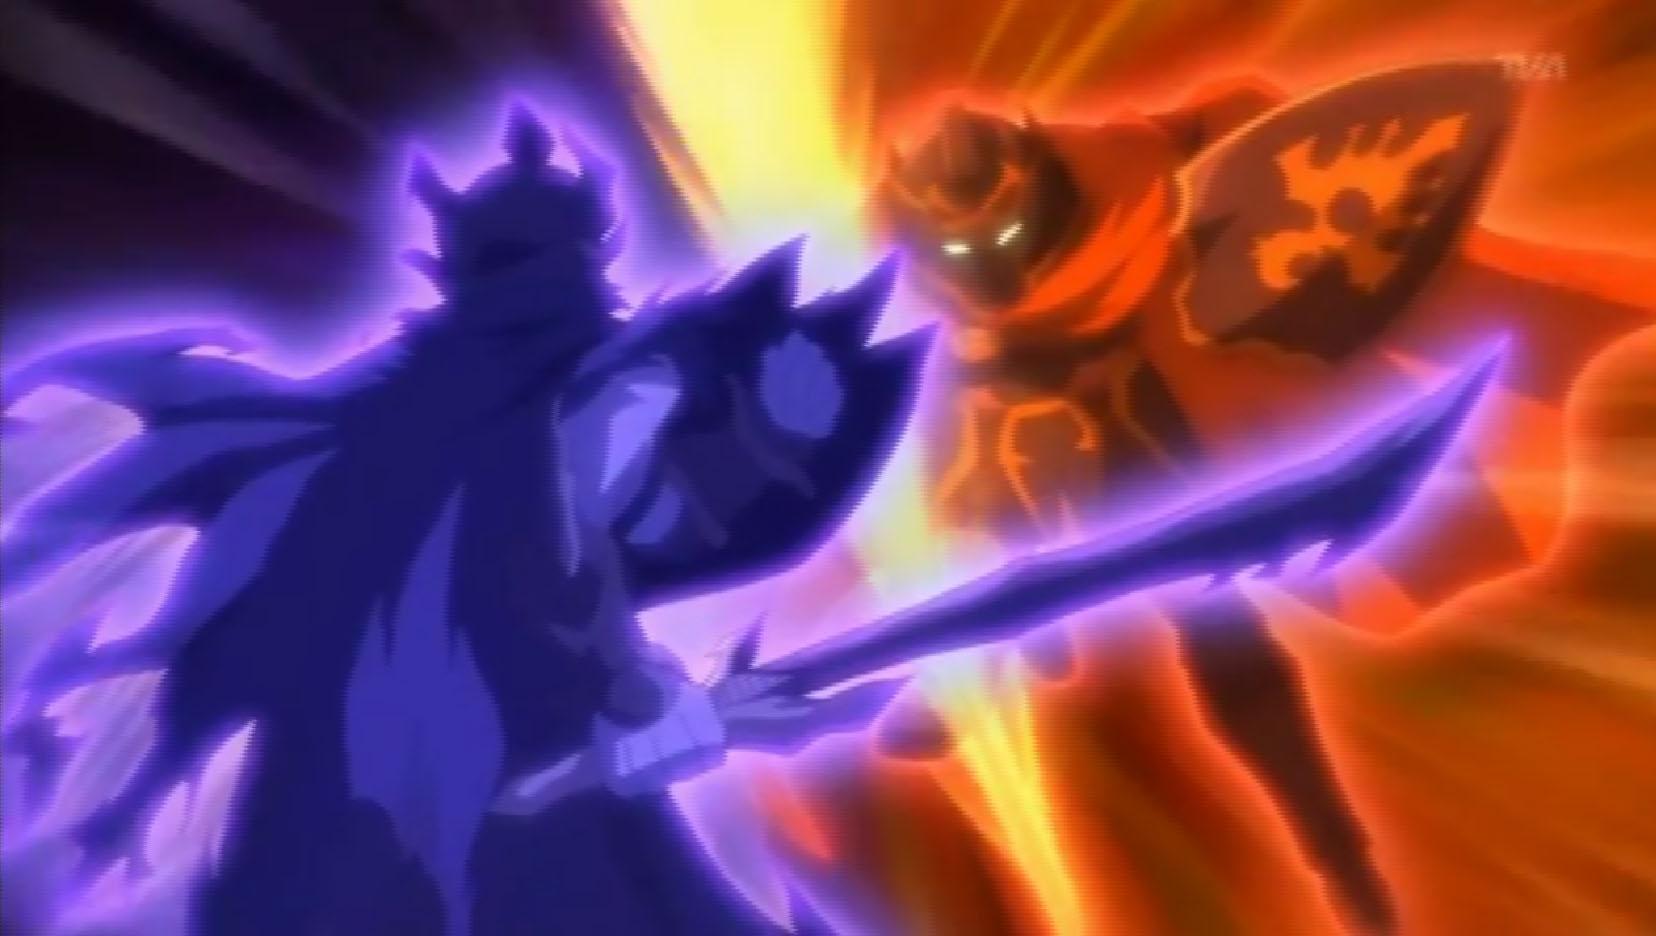 diablo nemesis beast - photo #17